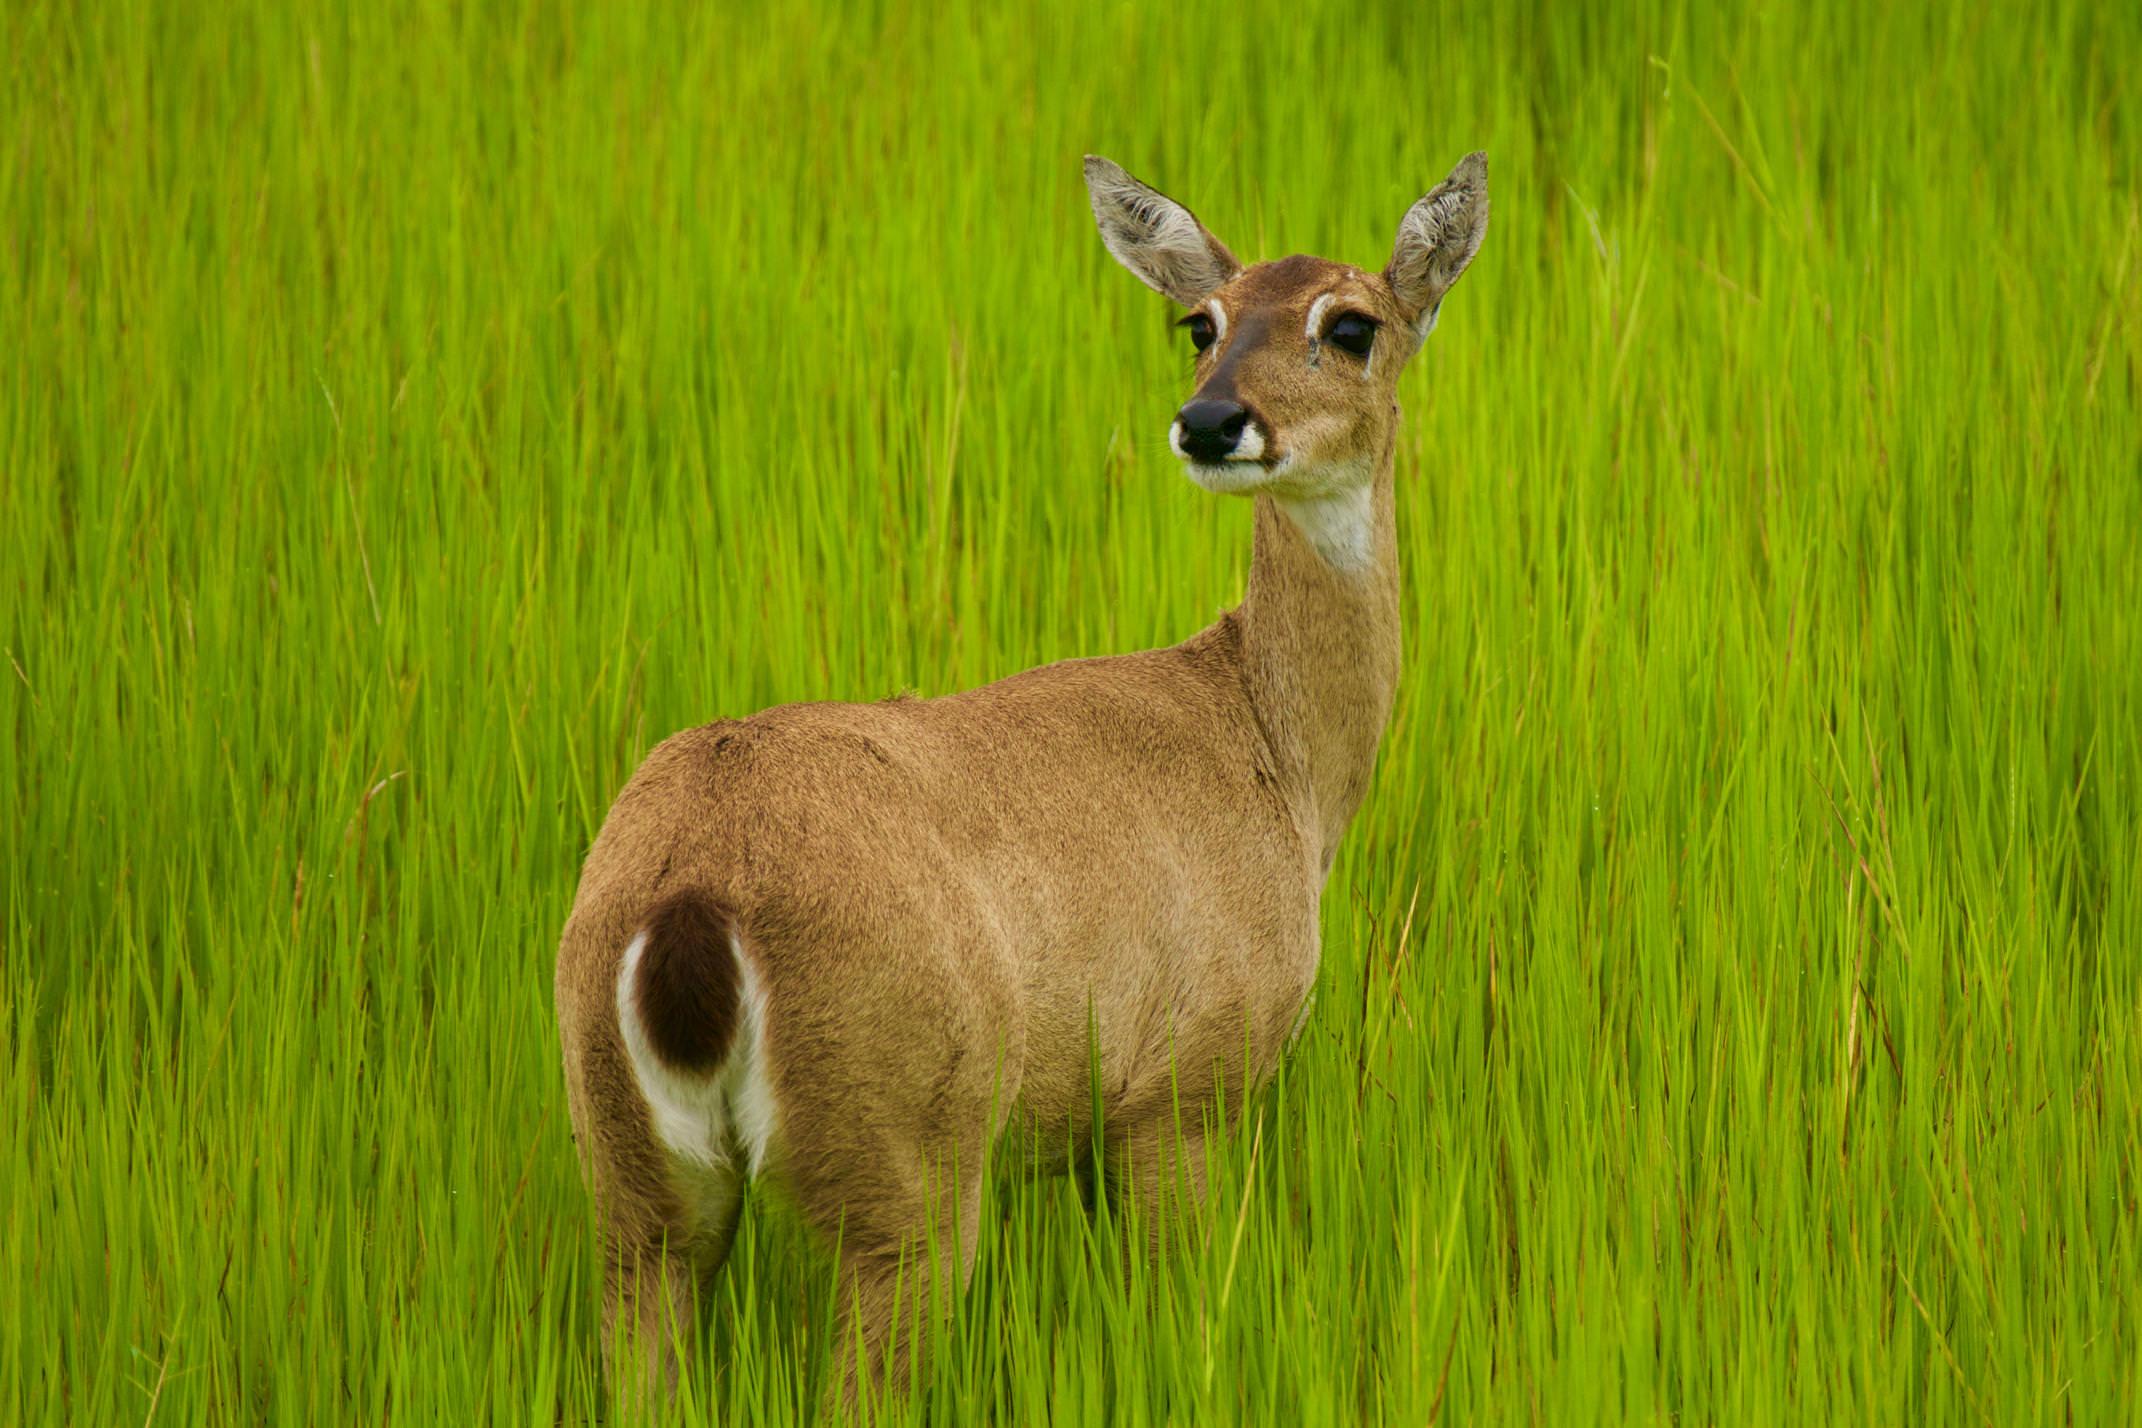 Brazil pantanal caiman lodge marsh deer single copyright thomas power pura aventura